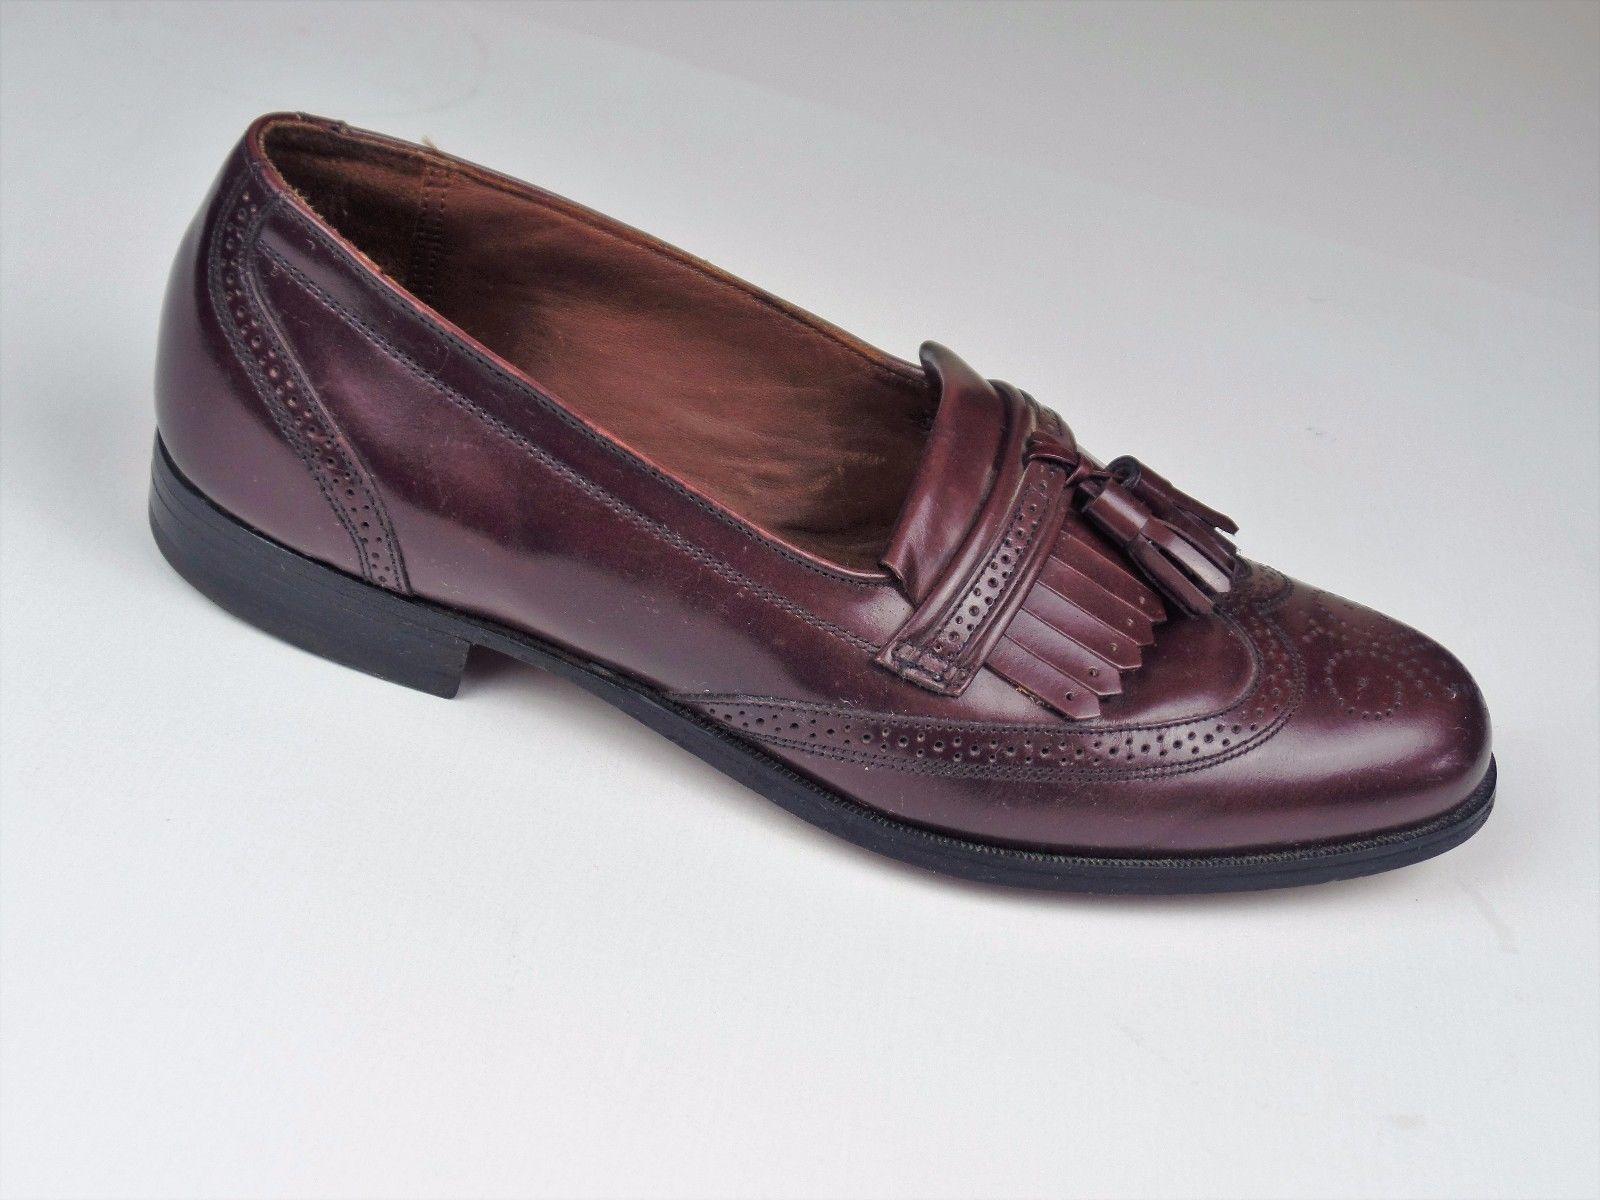 77cd45bdd1f BOSTONIAN Men s Dress Shoes Size 8M